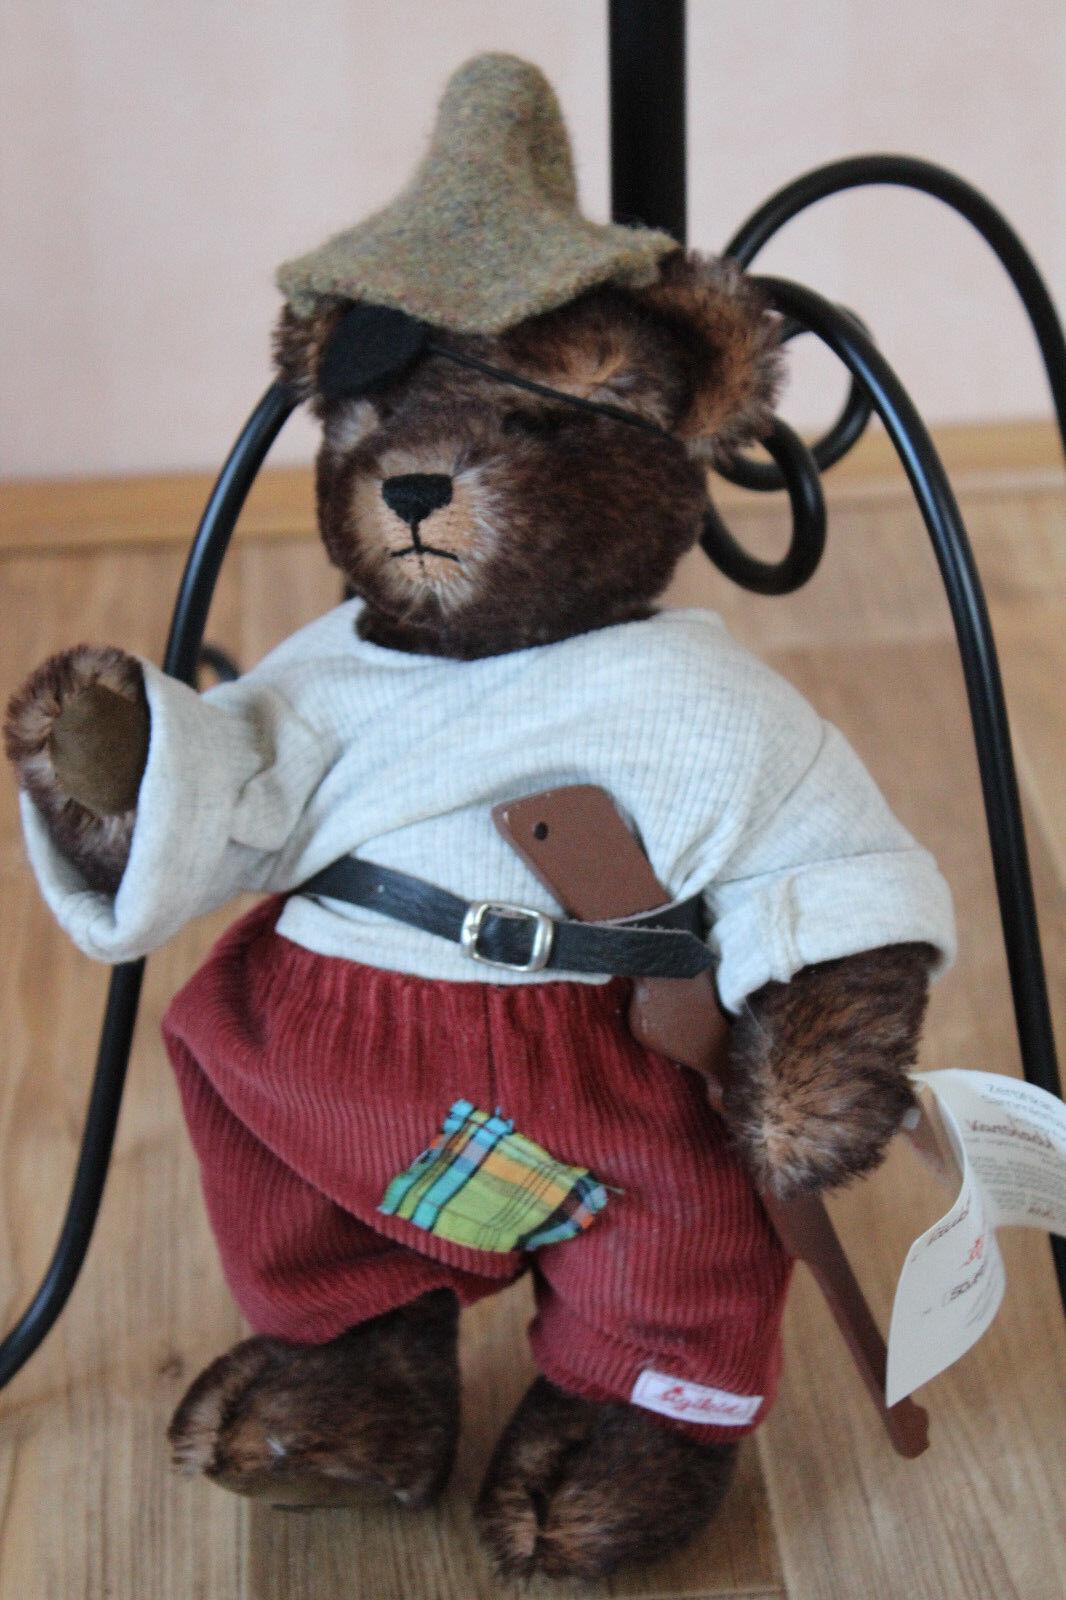 ***Neu ** Sigikid  Teddy *** Räuber Pistel ***Teddybär ***Limitierte Auflage ** Teddys